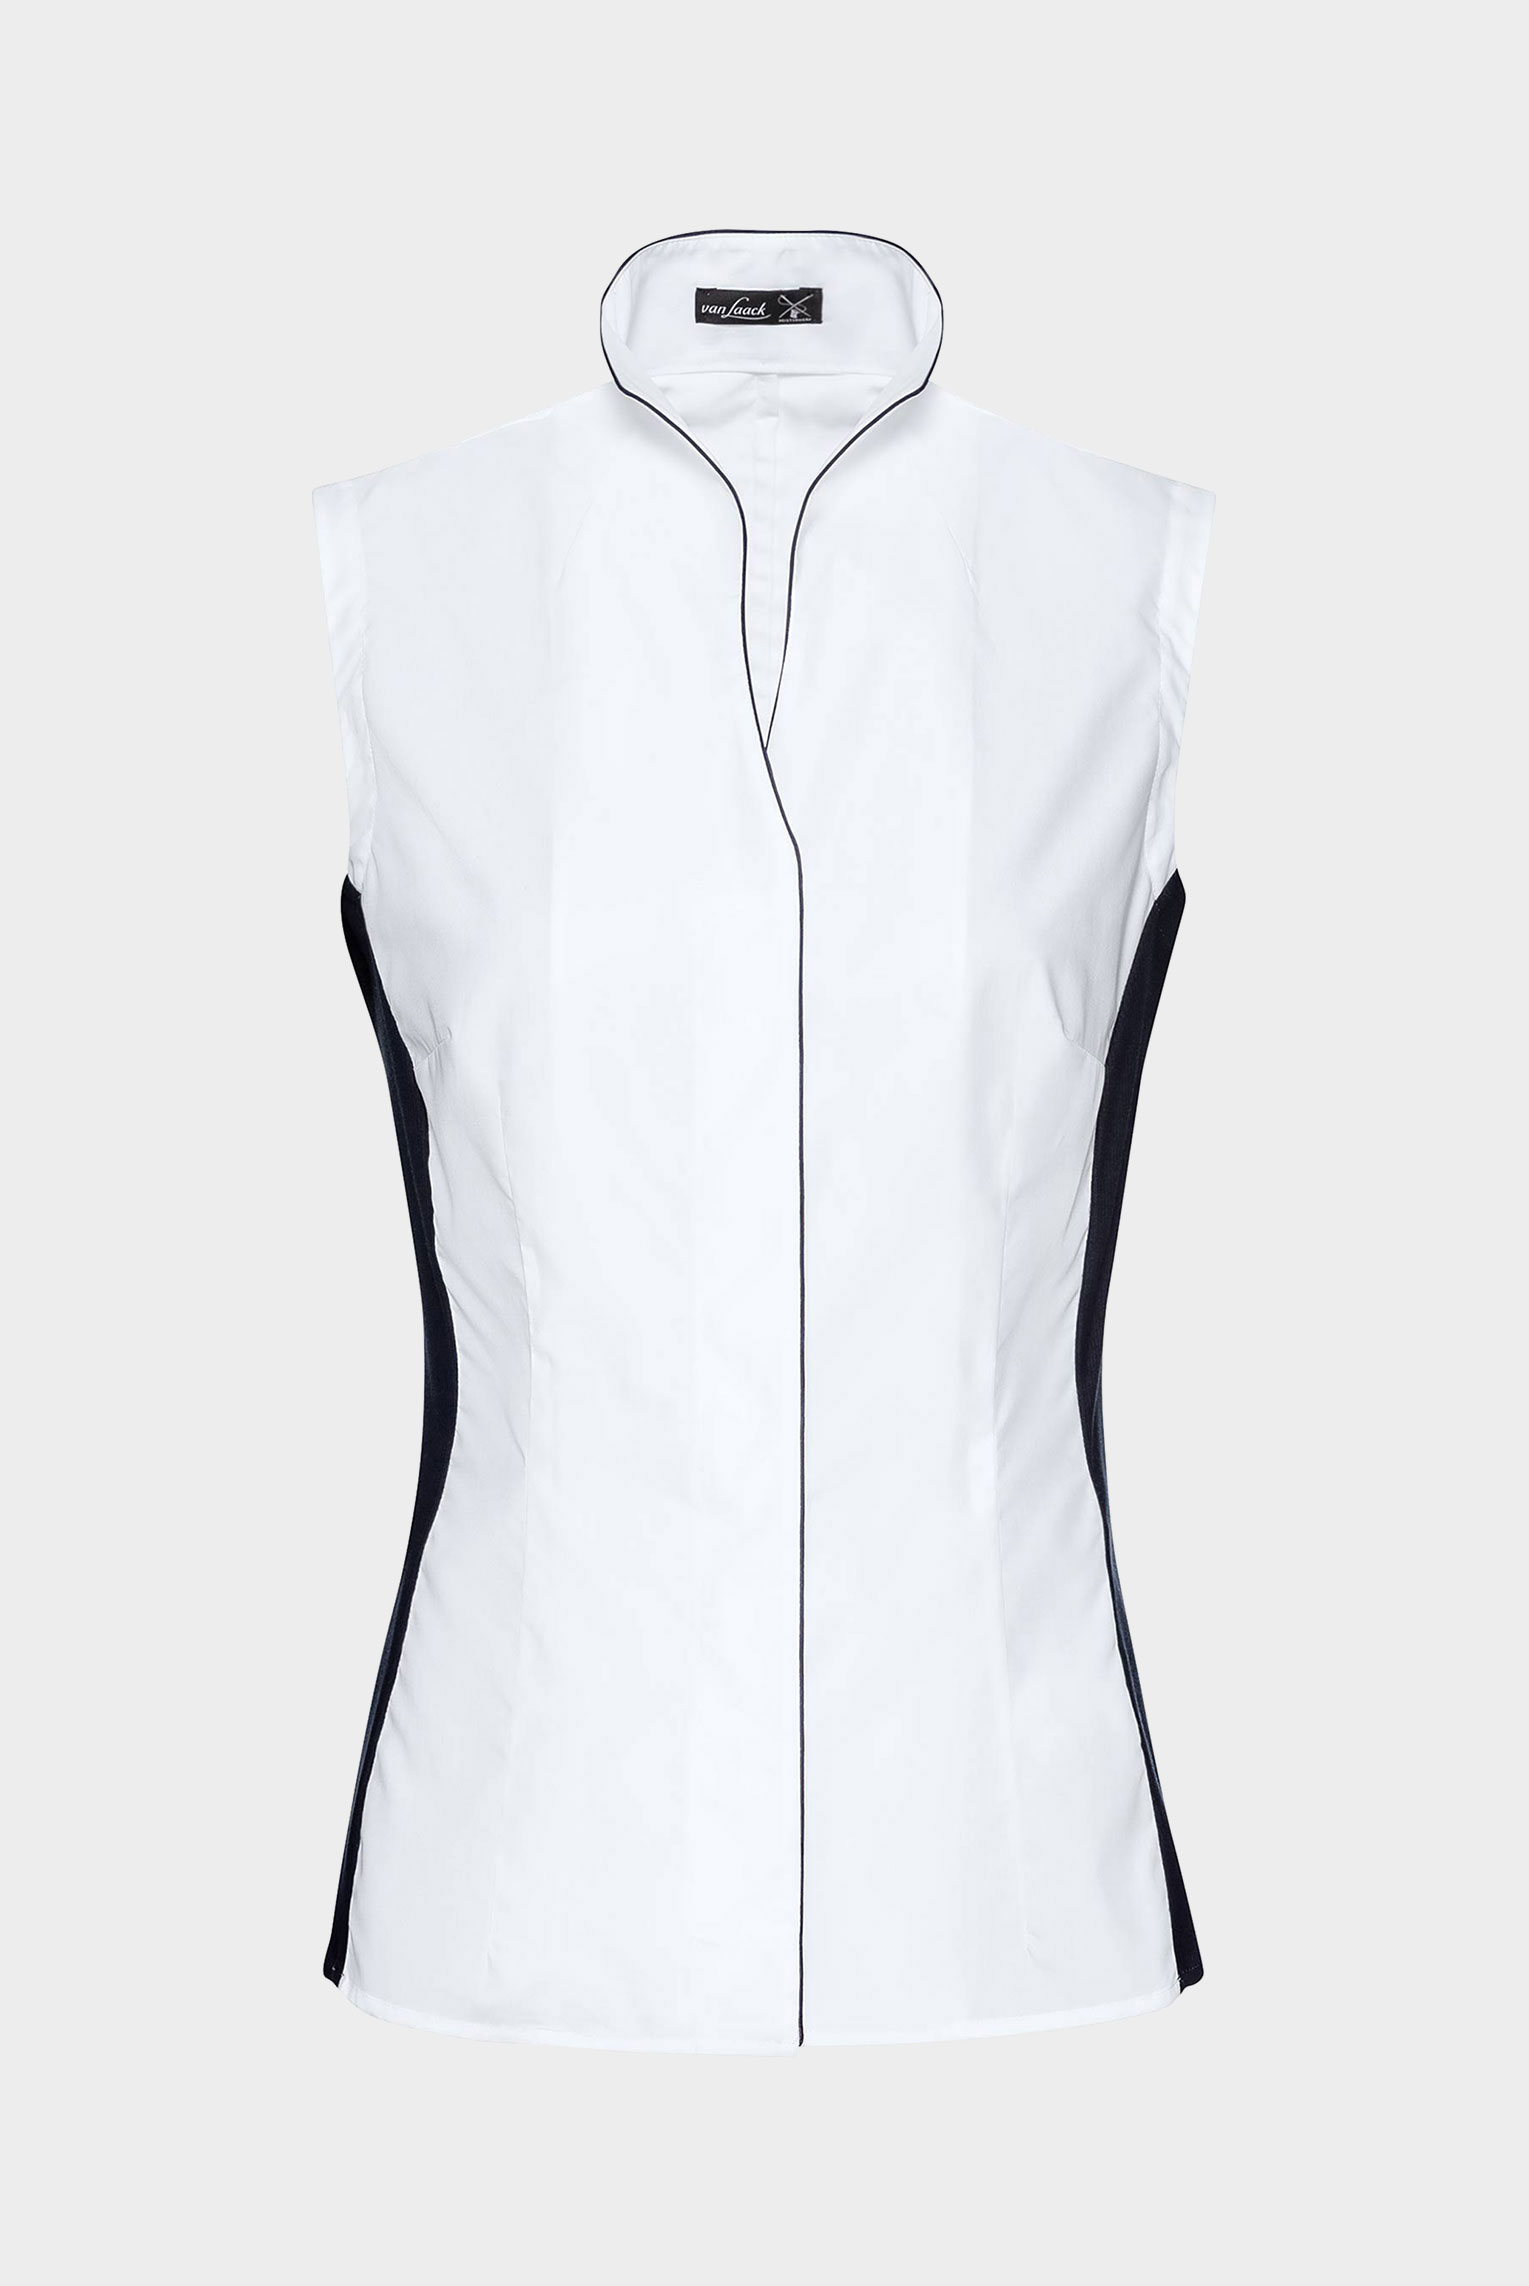 Meisterwerk Blouses+Myri-FPB - Sleeveless chalice collar Hybrid Shirt with contrast jersey inserts+05.518C.R4.160049.007.38